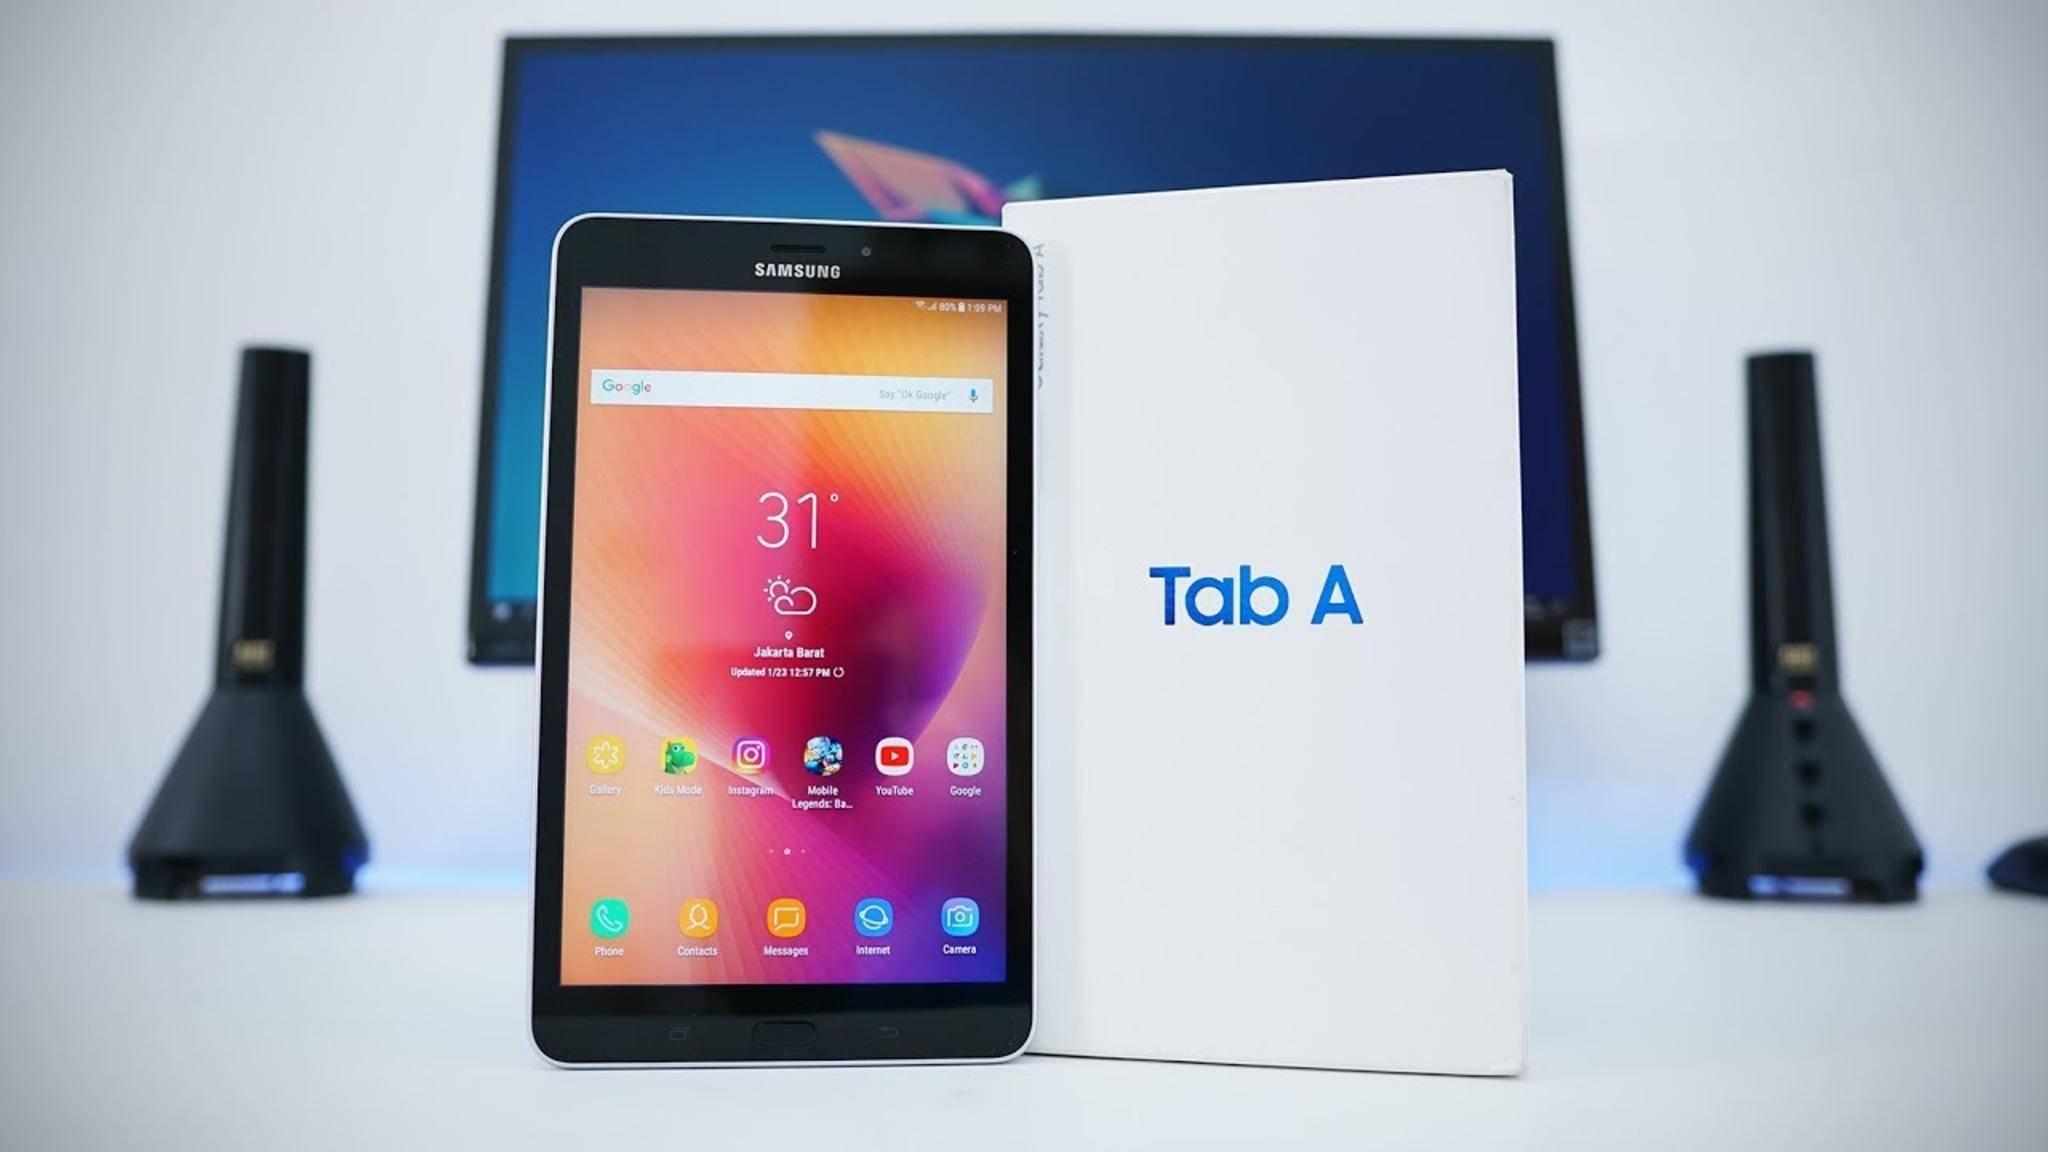 Das Galaxy Tab Advanced 2 sieht fast genauso aus wie das Galaxy Tab A 10.1.